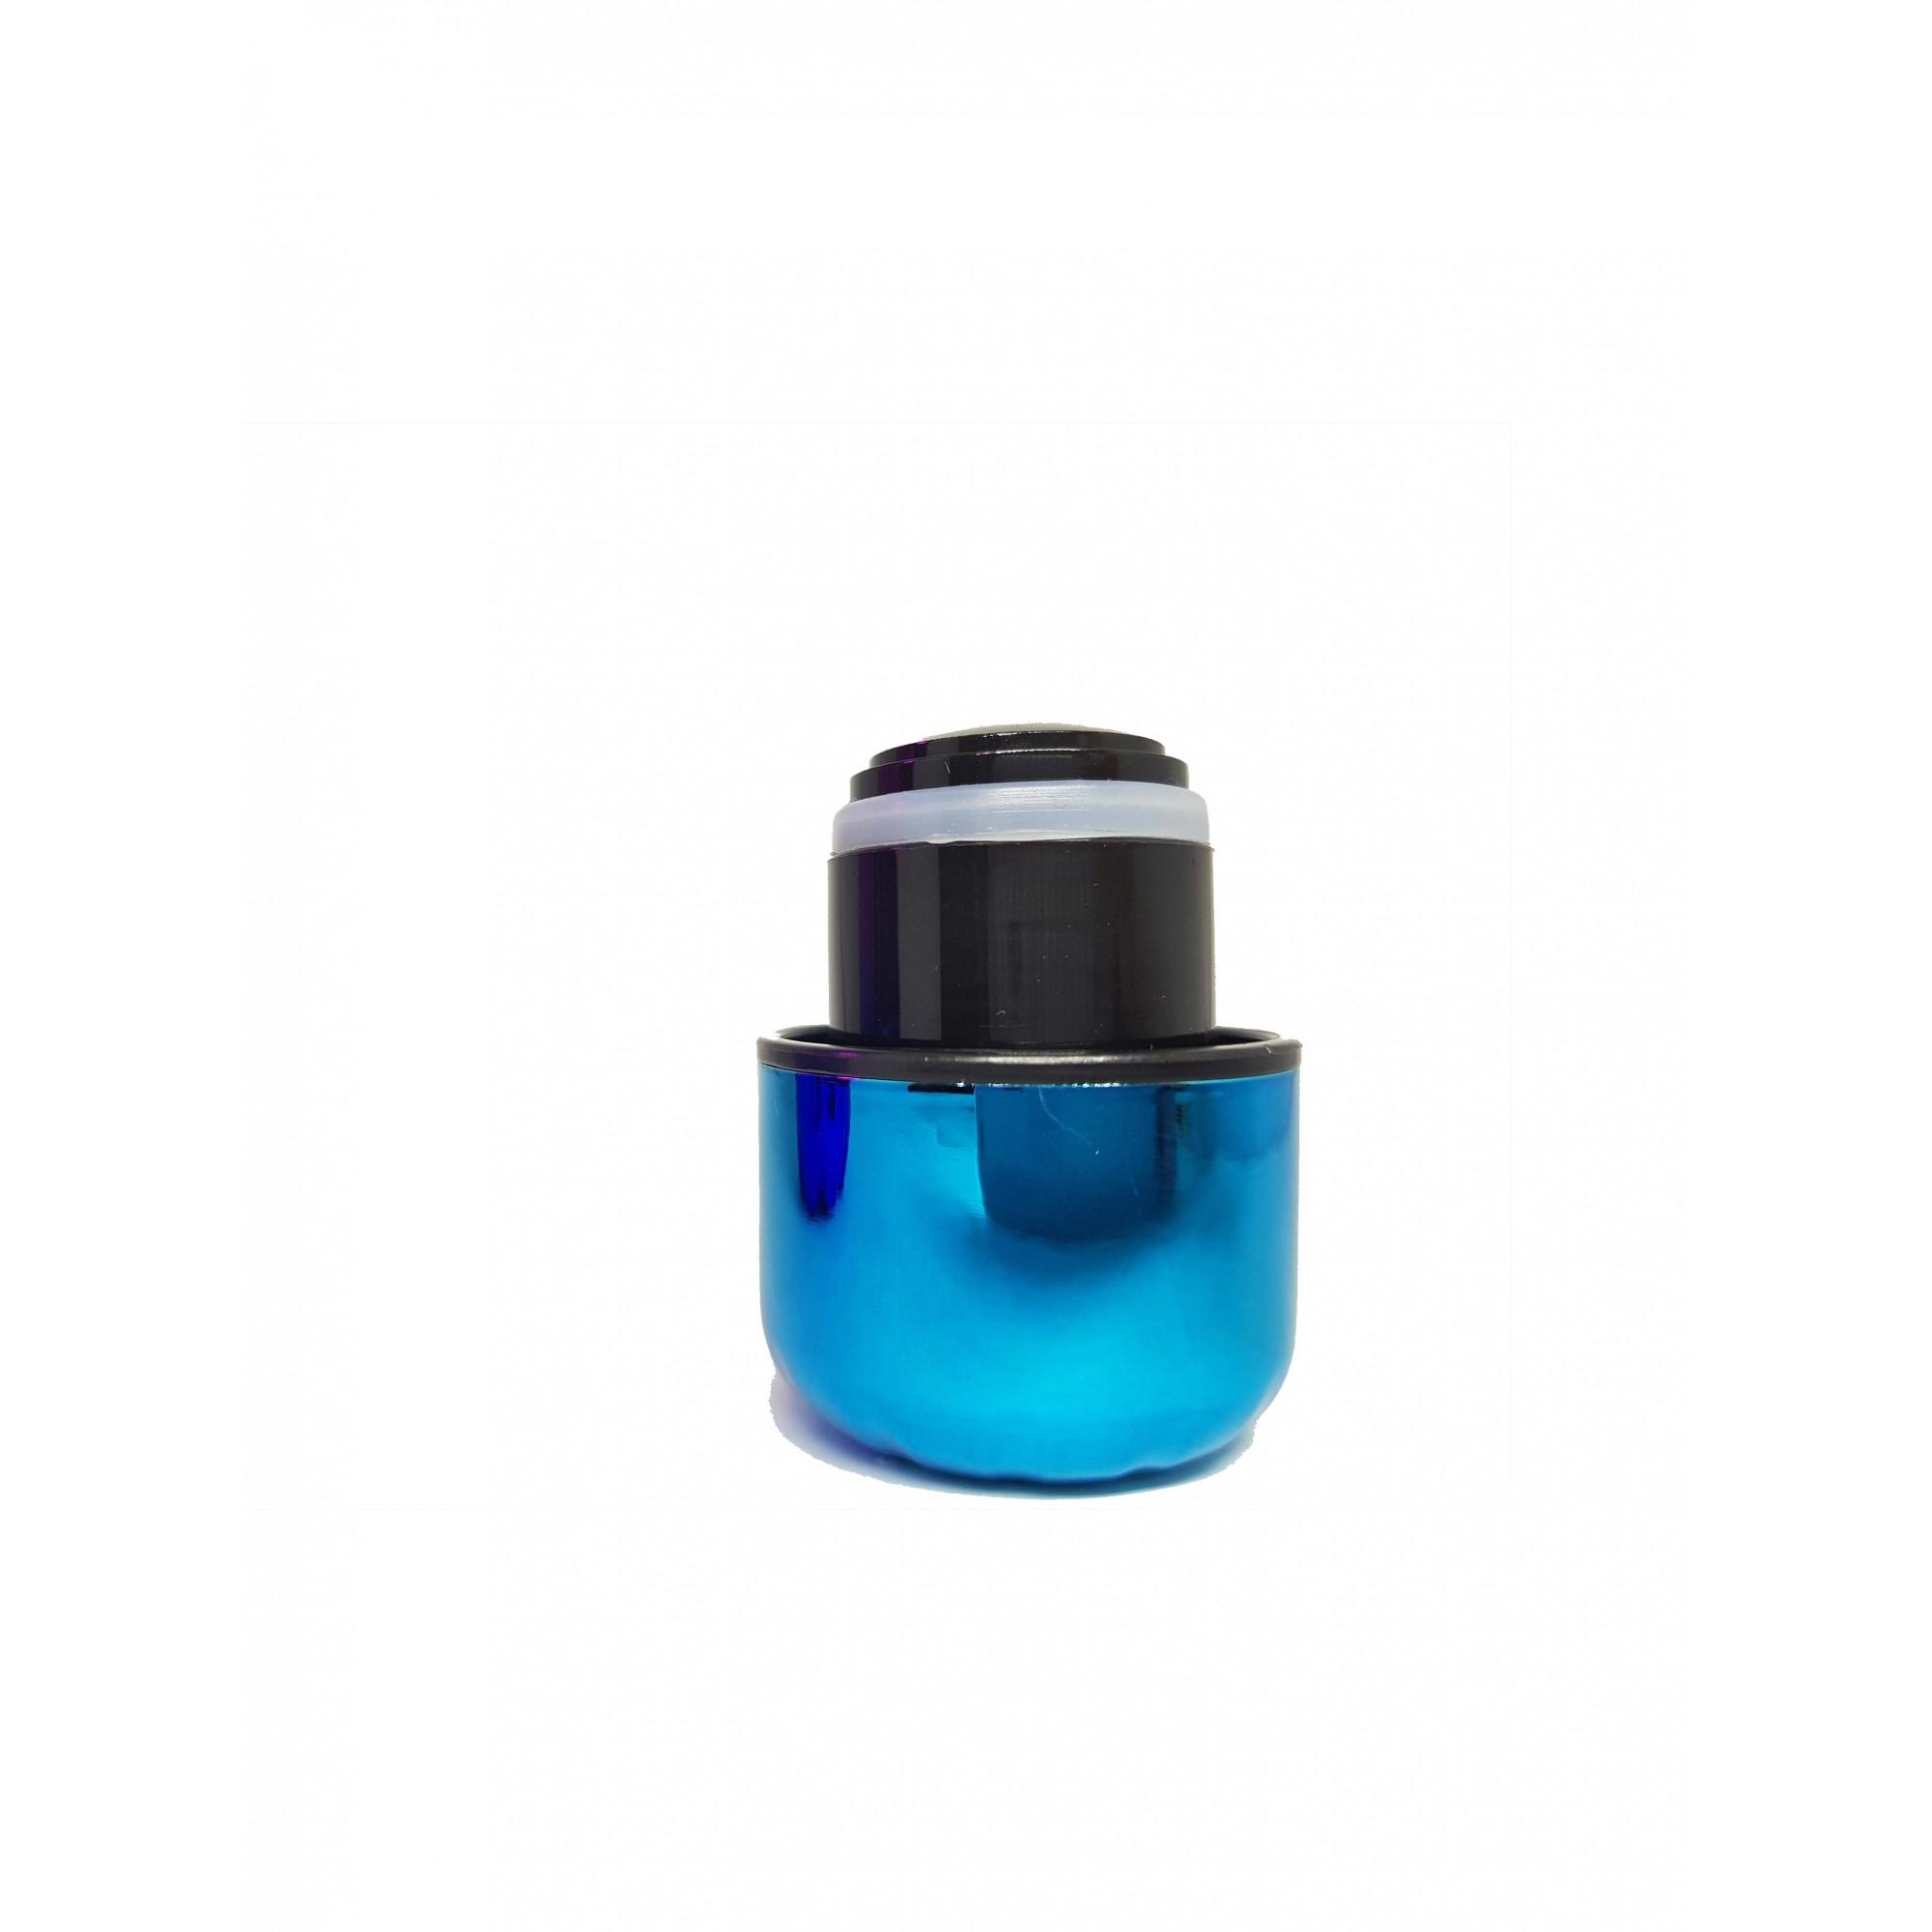 Kit Mundo Bolsa papel + garrafa Holográfica + kit 5 em 1 inox Azul